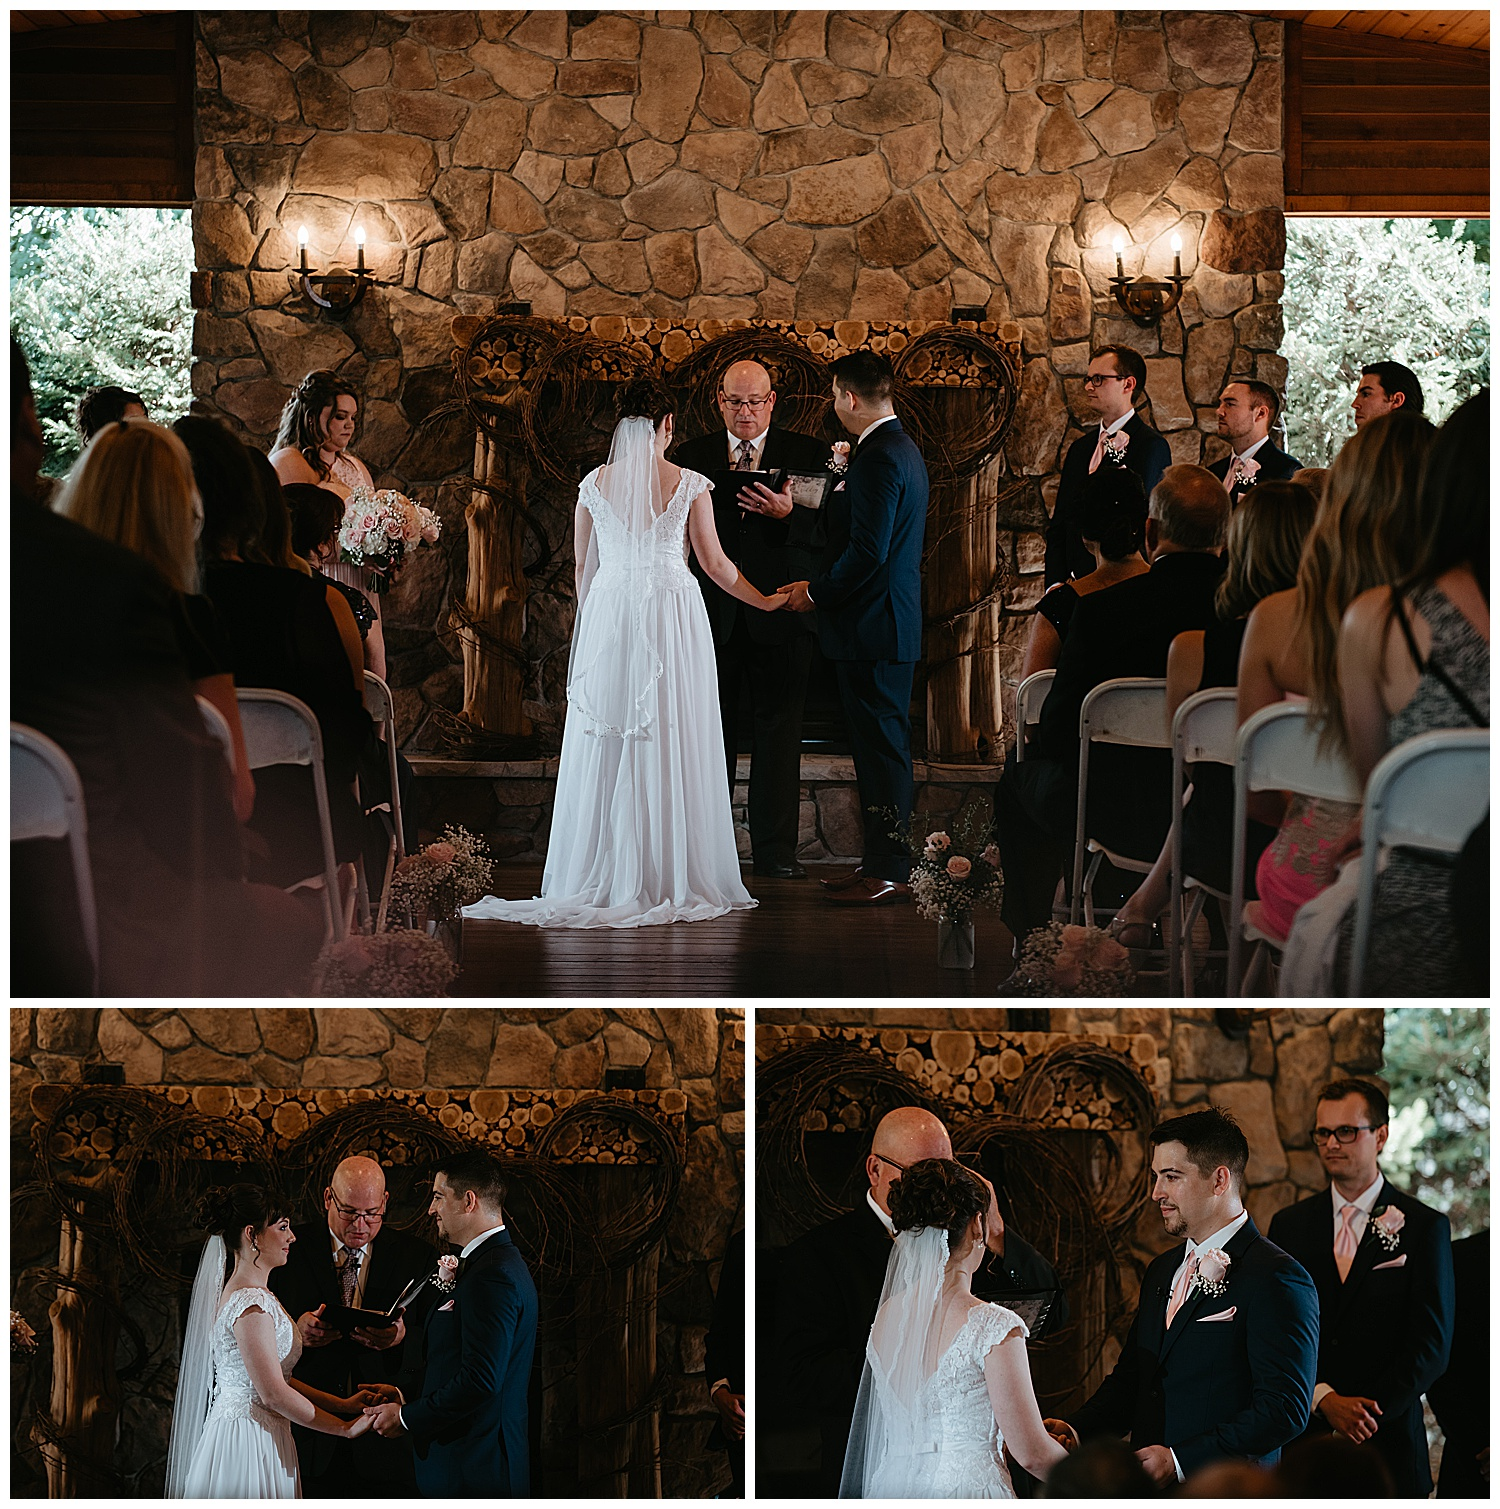 NEPA-Mount-Pocono-Wedding-Photographer-at-the-Stroudsmoor-Country-Inn-Stroudsburg-PA_0029.jpg